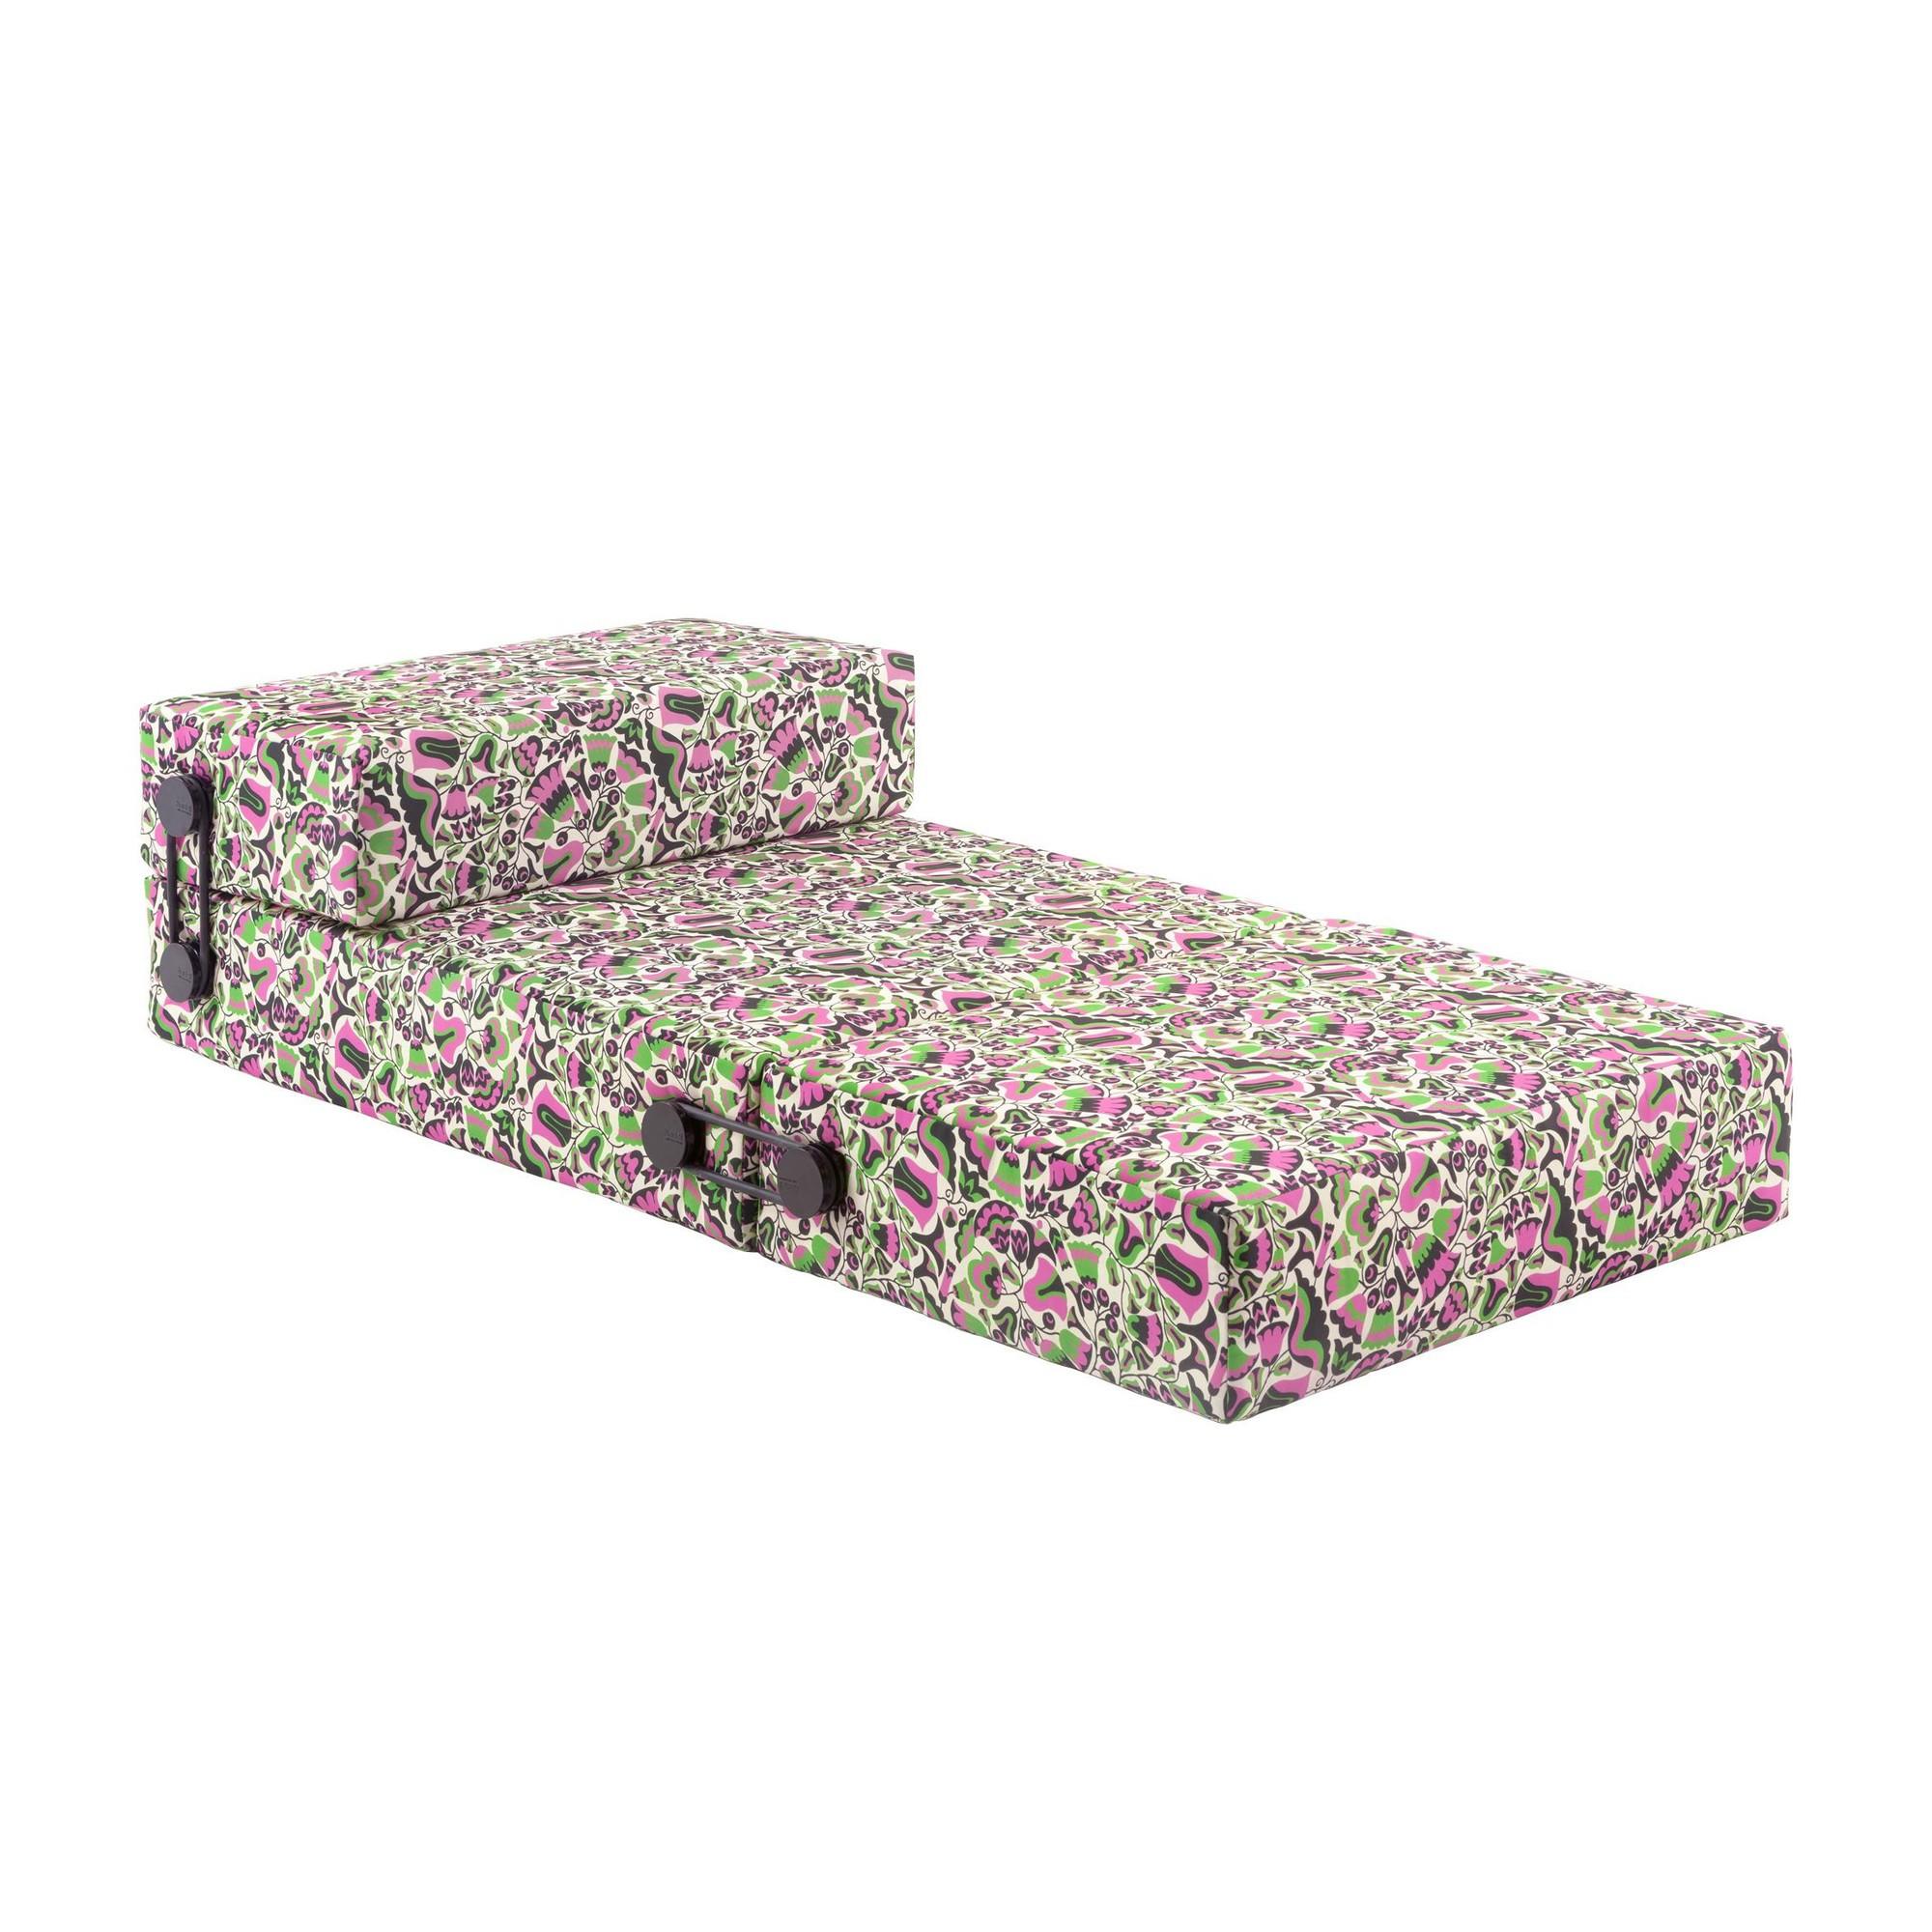 Peachy La Double J Trix Sofa Bed Machost Co Dining Chair Design Ideas Machostcouk